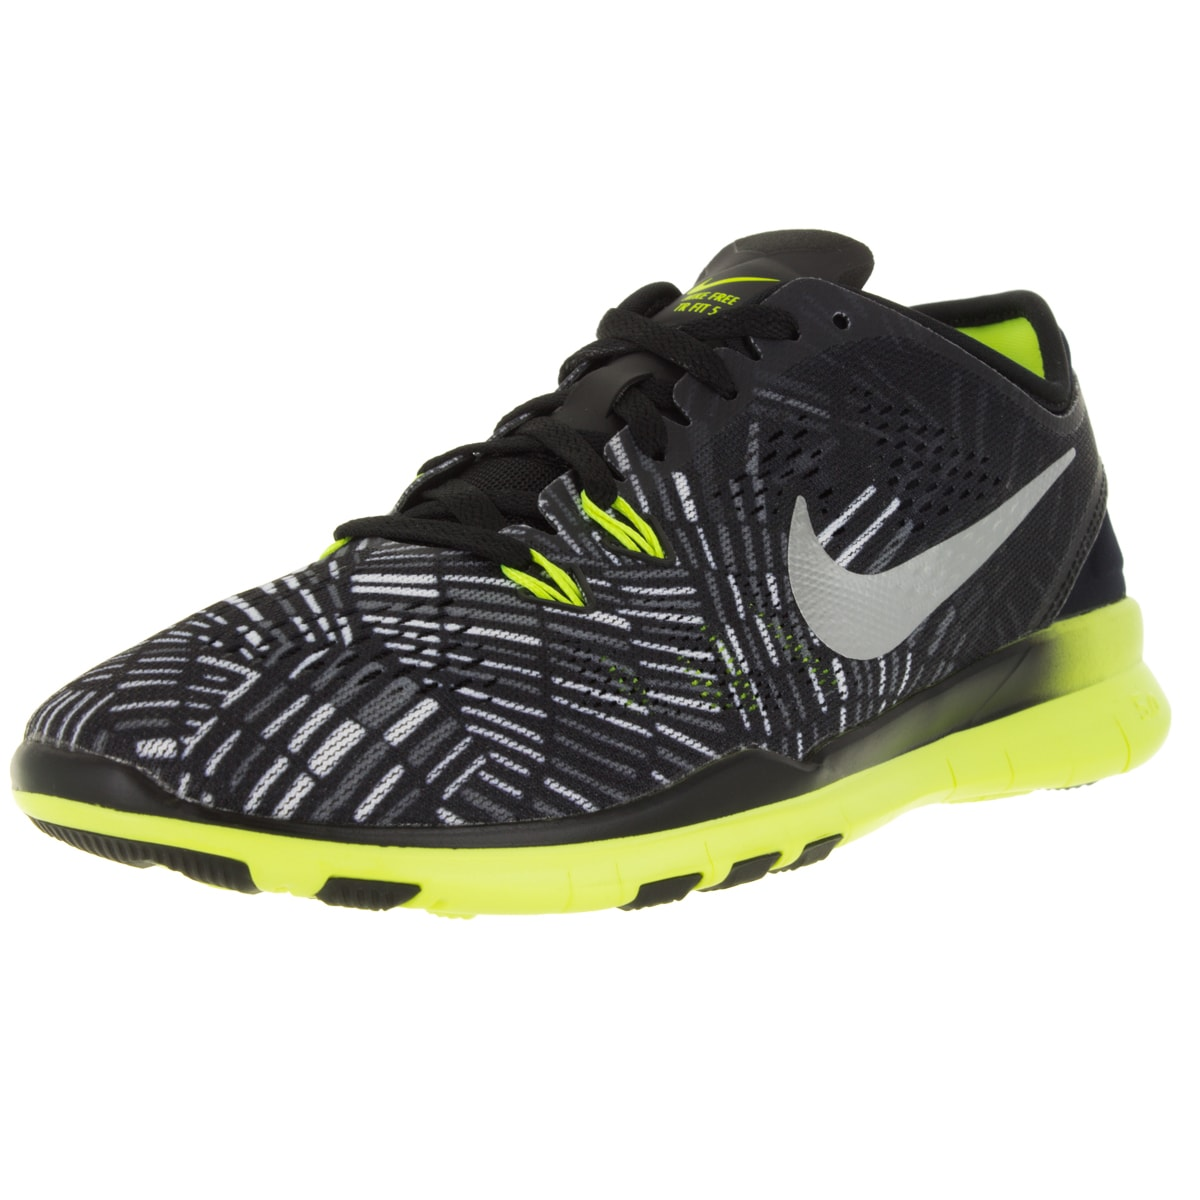 Nike Women's Free 5.0 Tr Fit 5 Prt Black/Metallic Silver/...